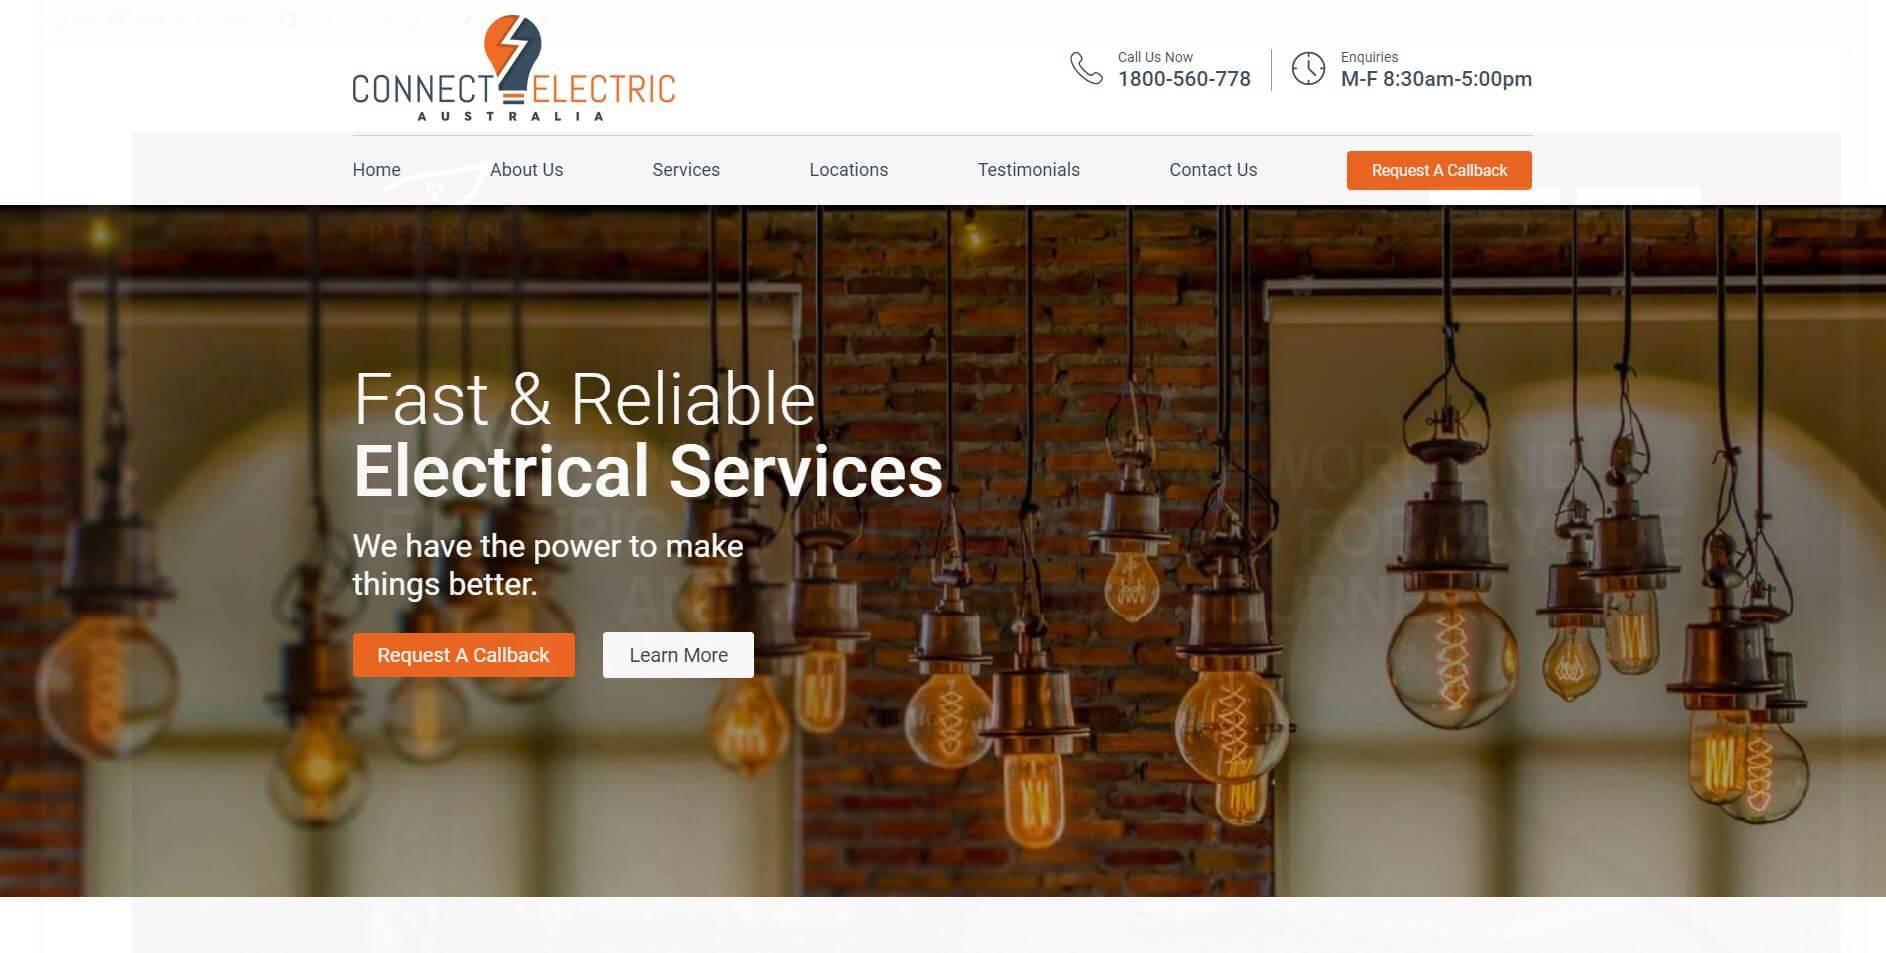 Connect Electric Australia